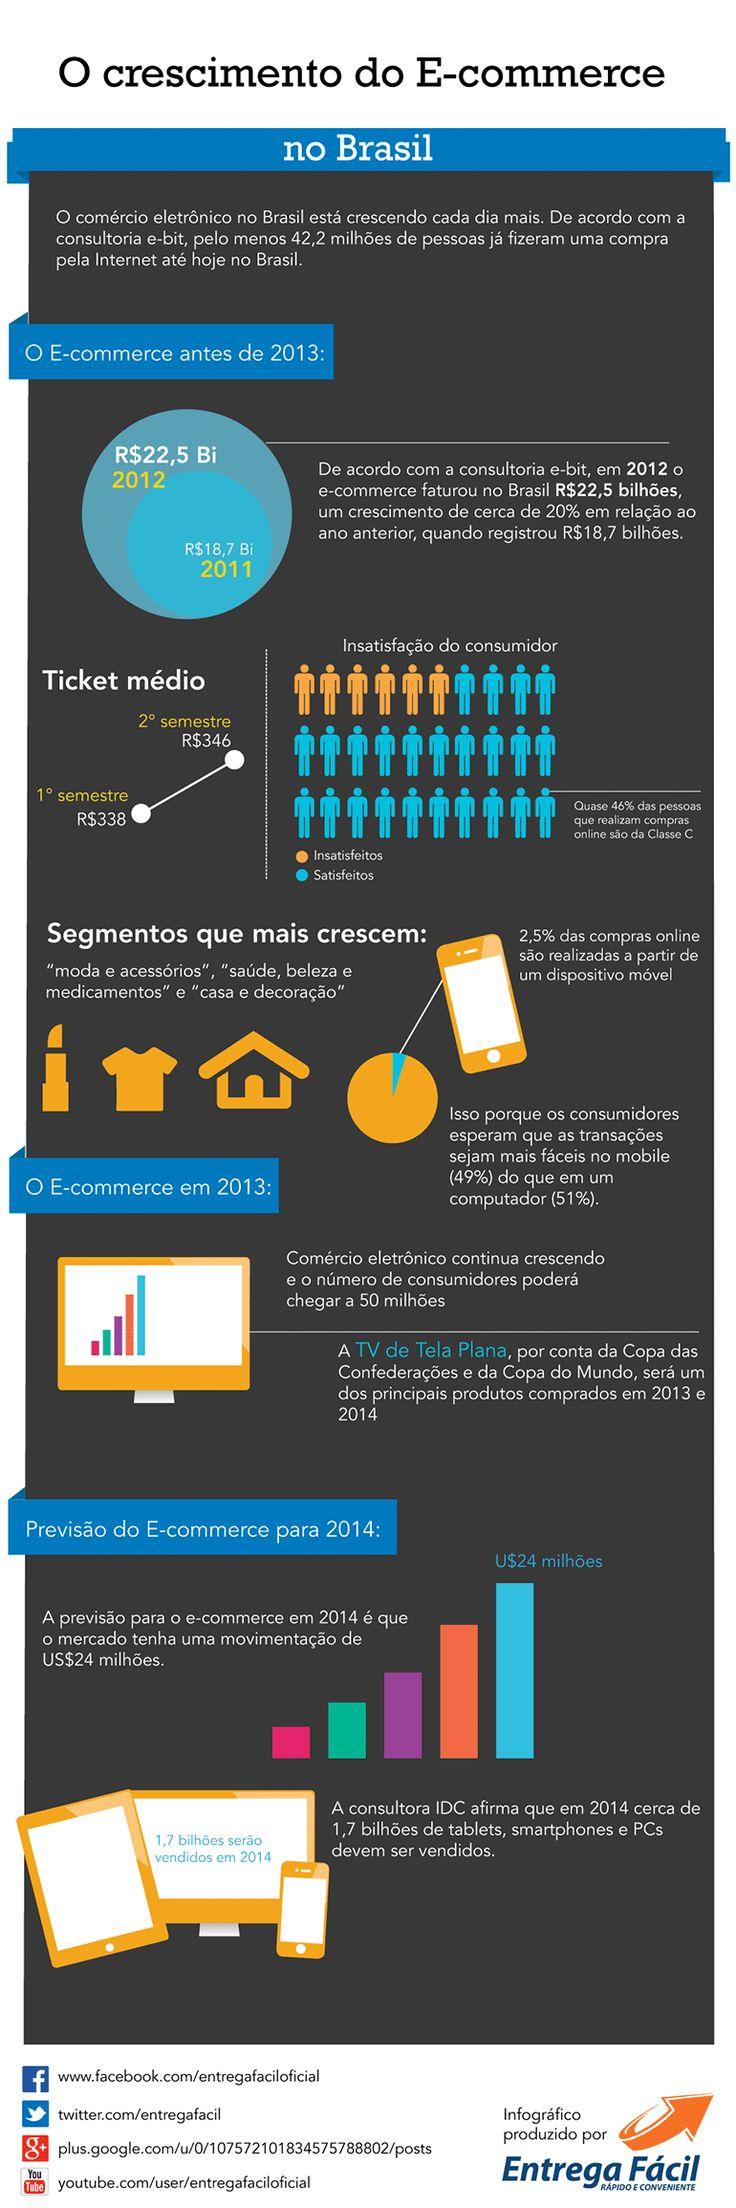 #e-commerce #infographic